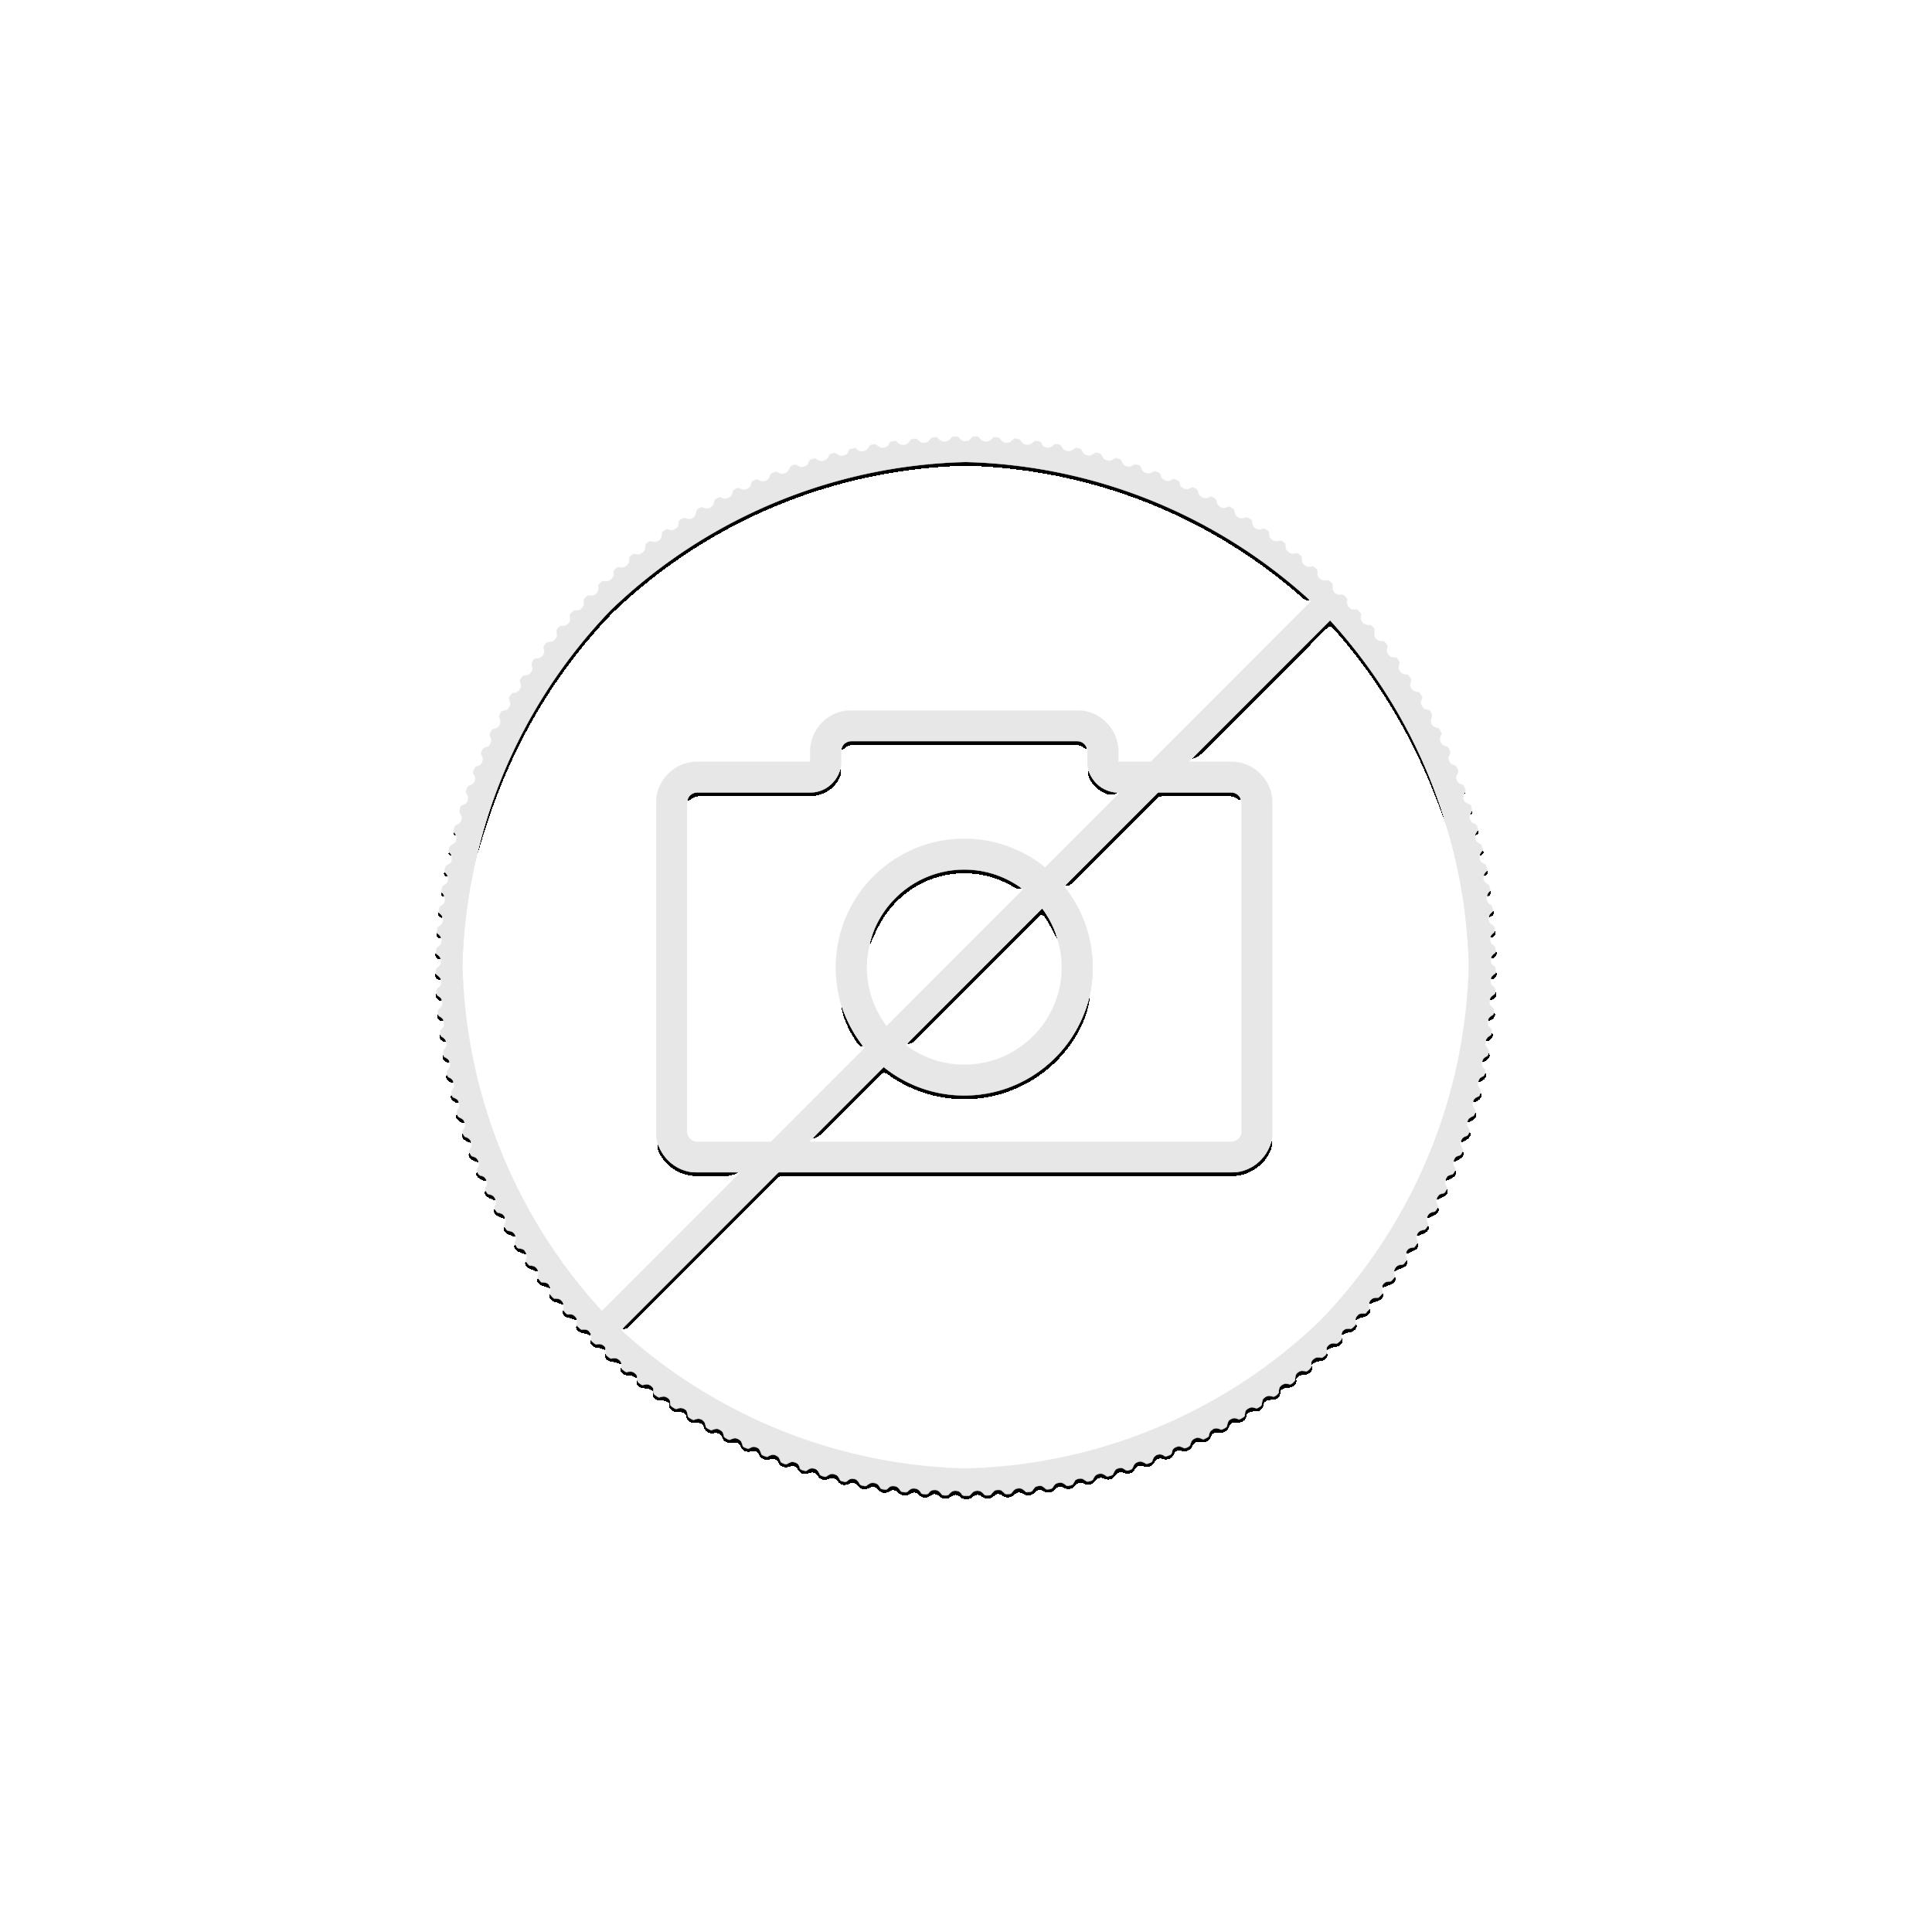 1 Troy ounce Gouden Eagle Ultra High Relief 2009 voorzijde